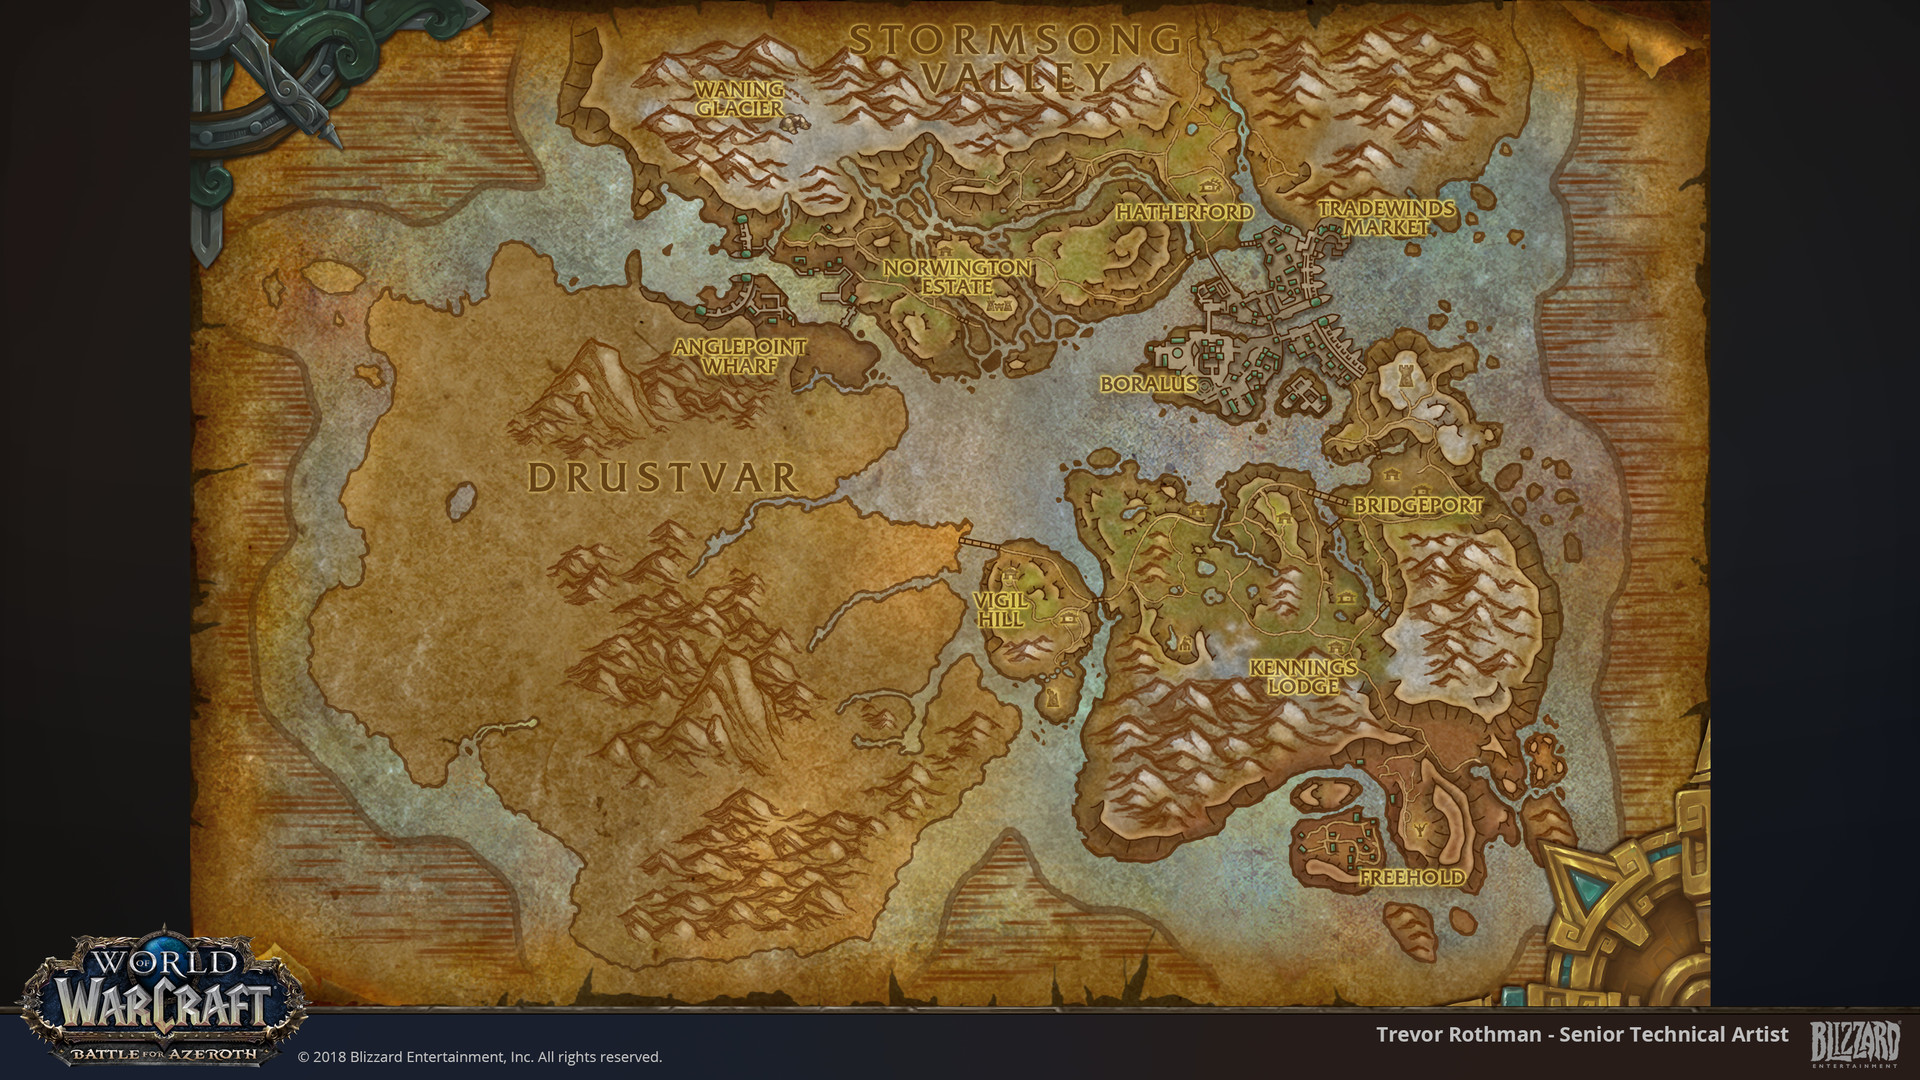 ArtStation - World of Warcraft: Battle for Azeroth Maps, Trevor Rothman